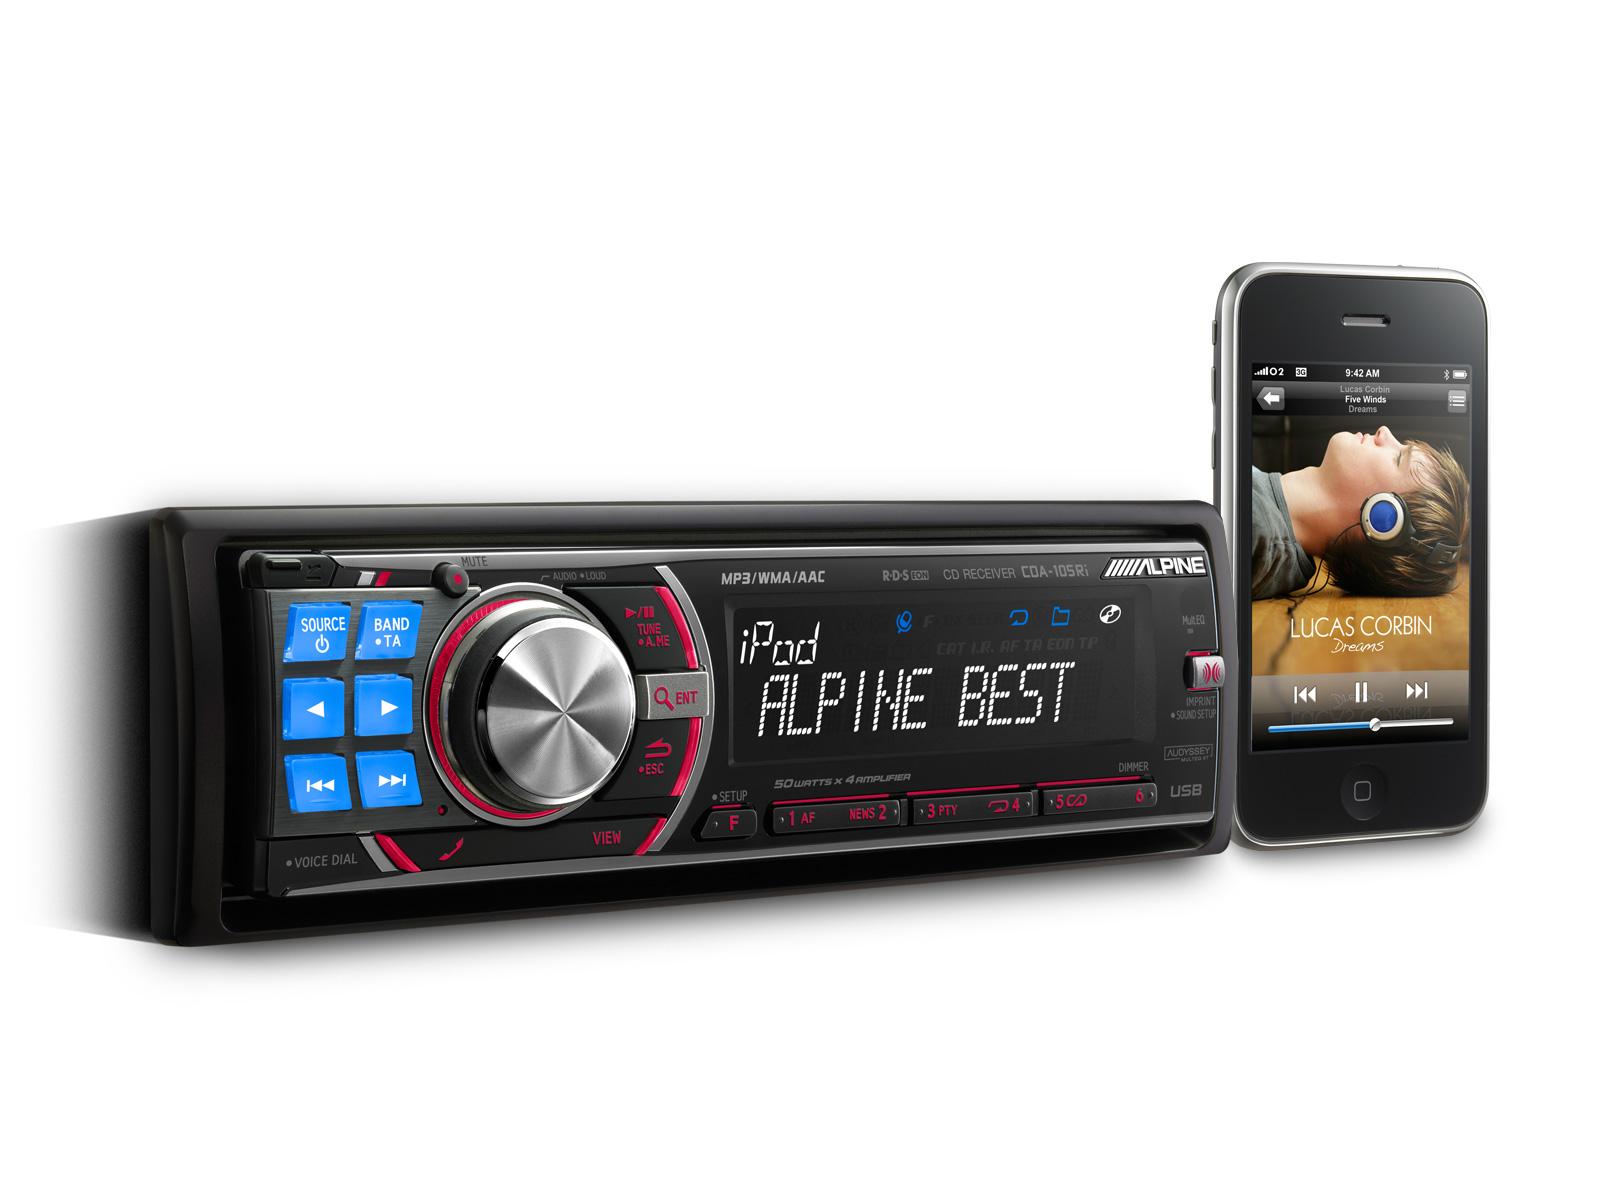 Cd Receiver Usb Ipod Controller Alpine Cda 105ri Iphone 4 Wiring Diagram